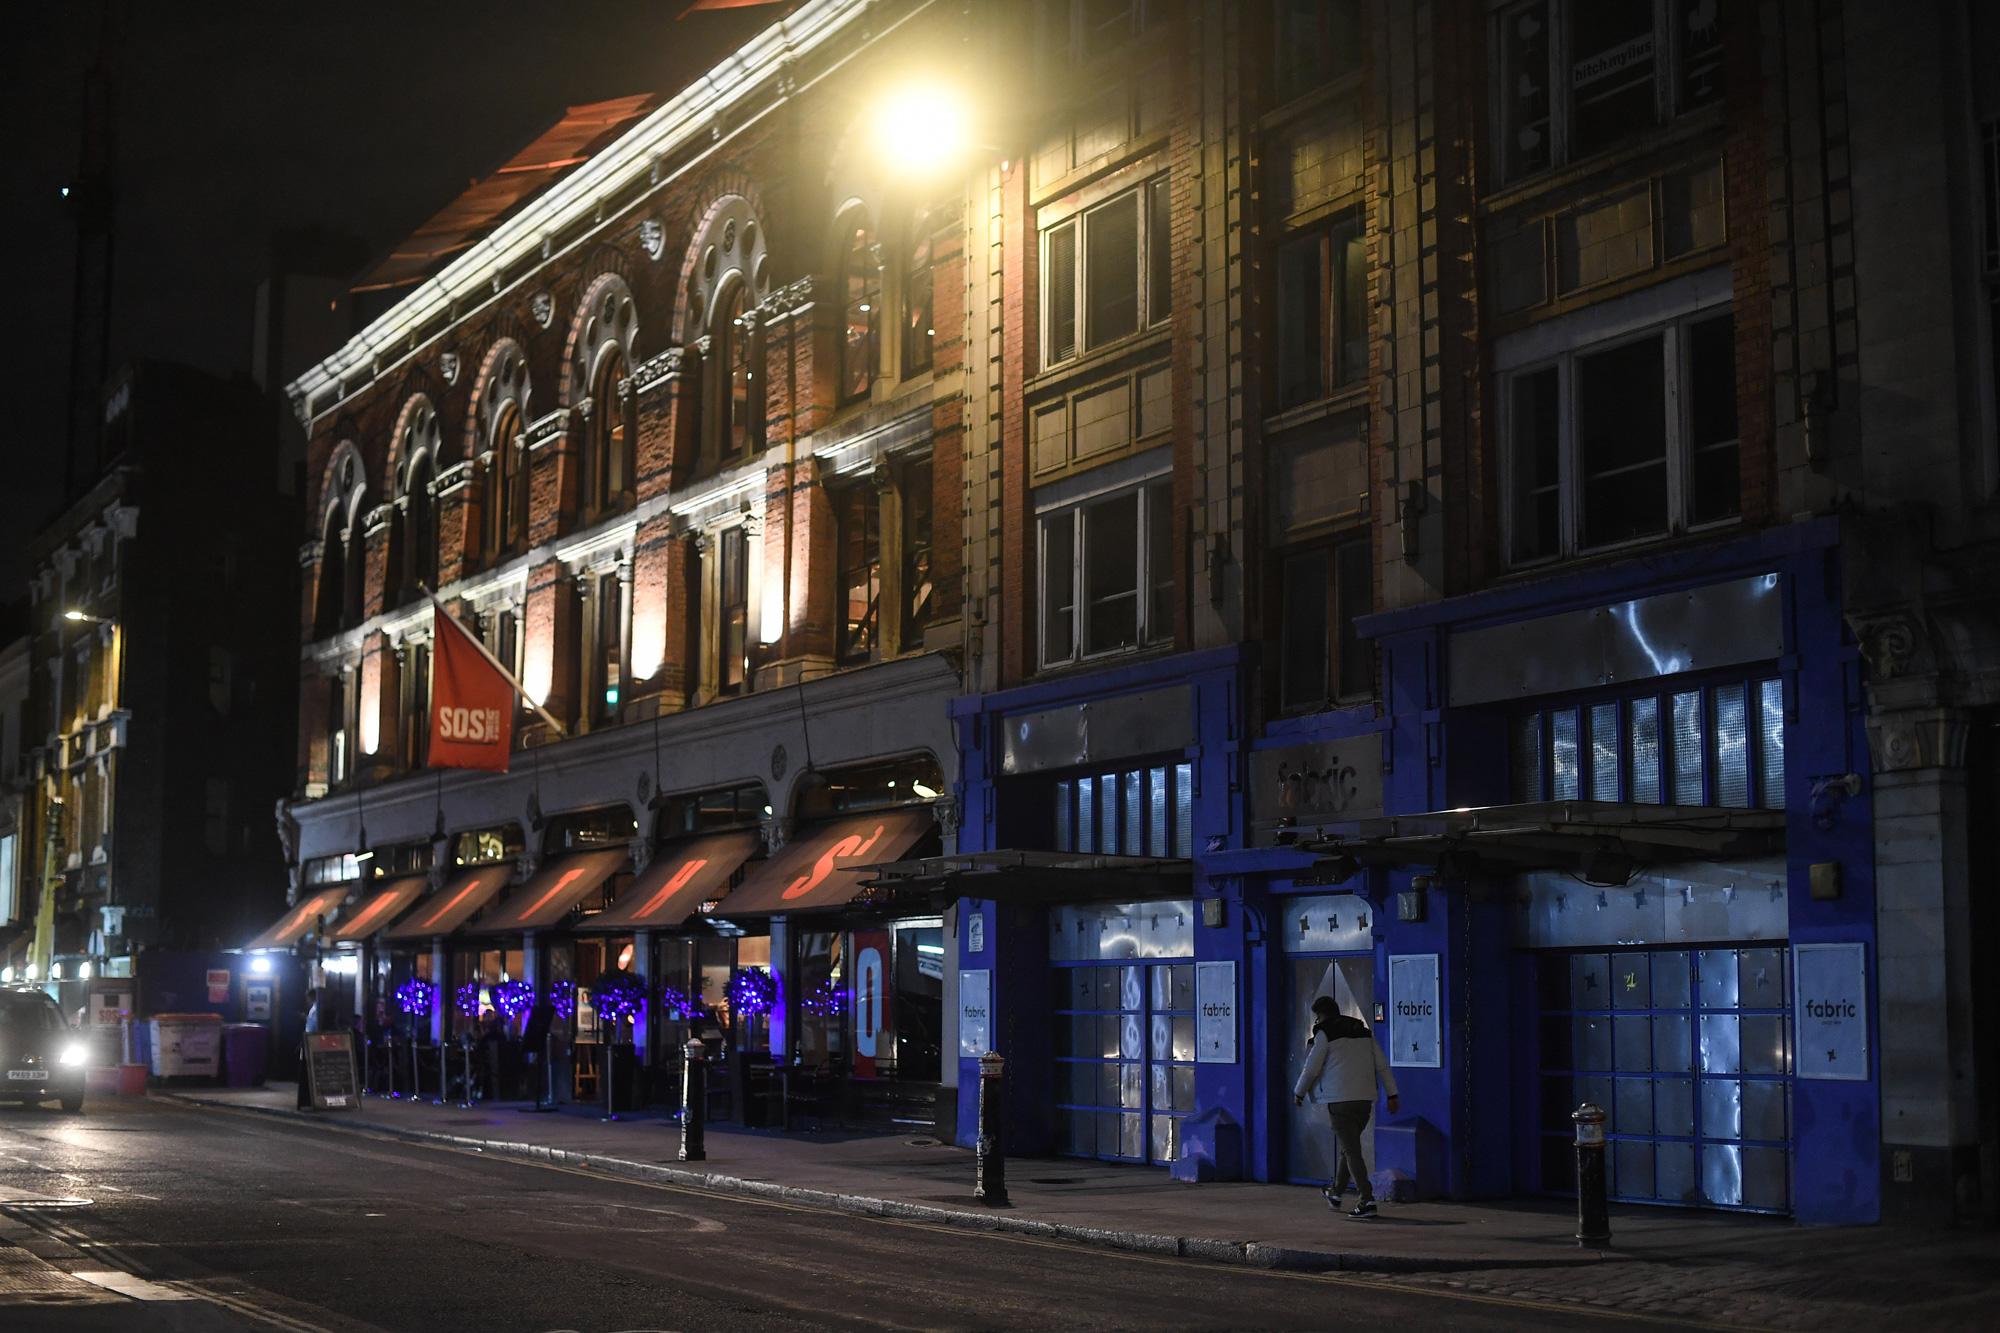 Fabric nightclub is seen on October 1 in London.